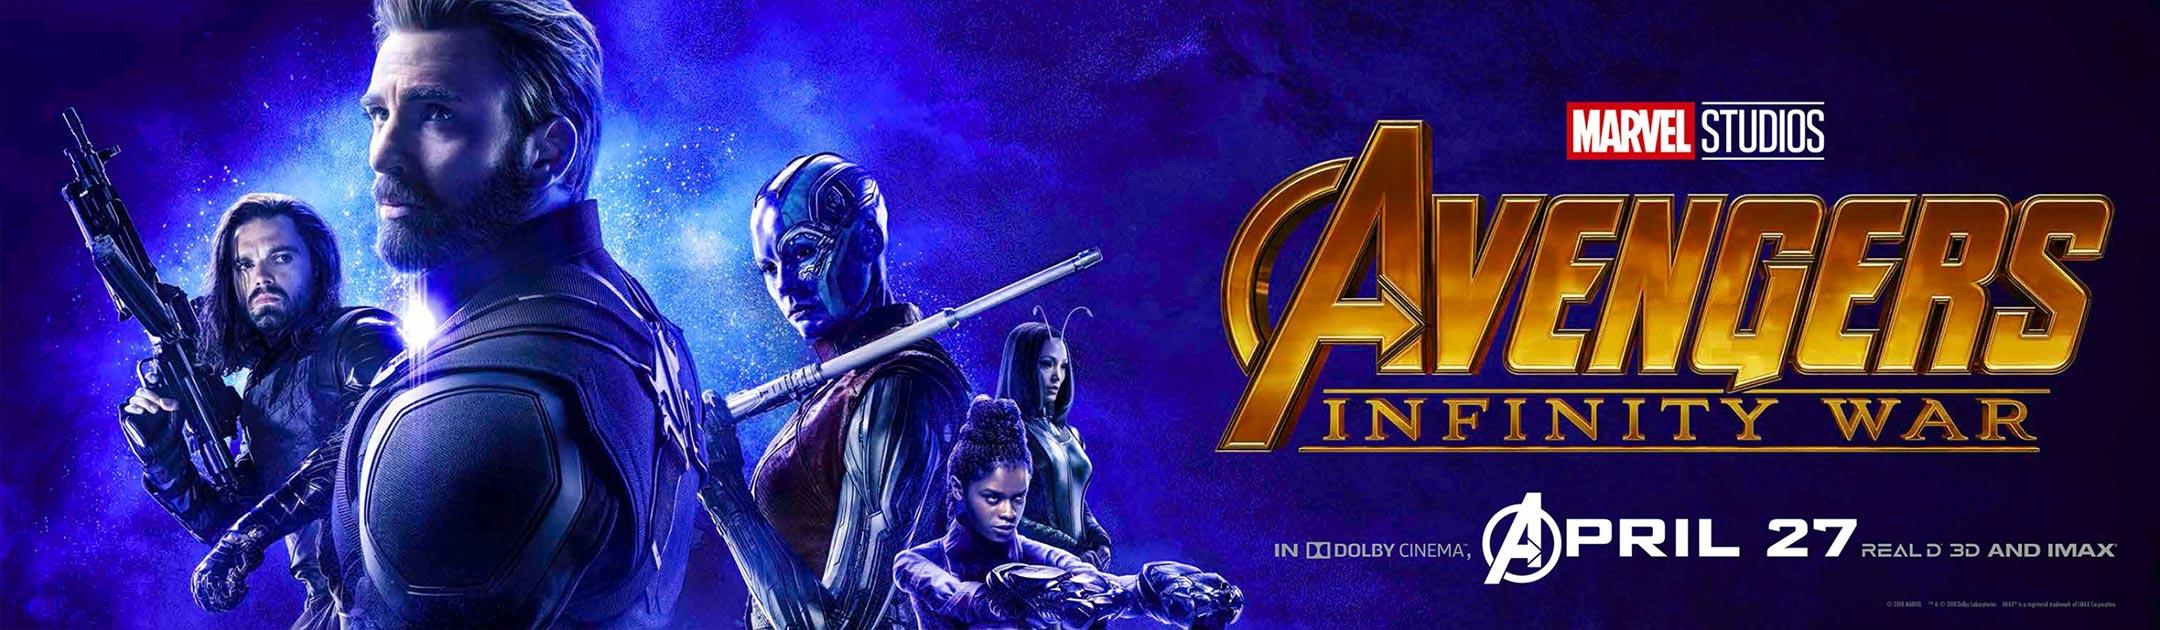 Avengers: Infinity War Poster #36